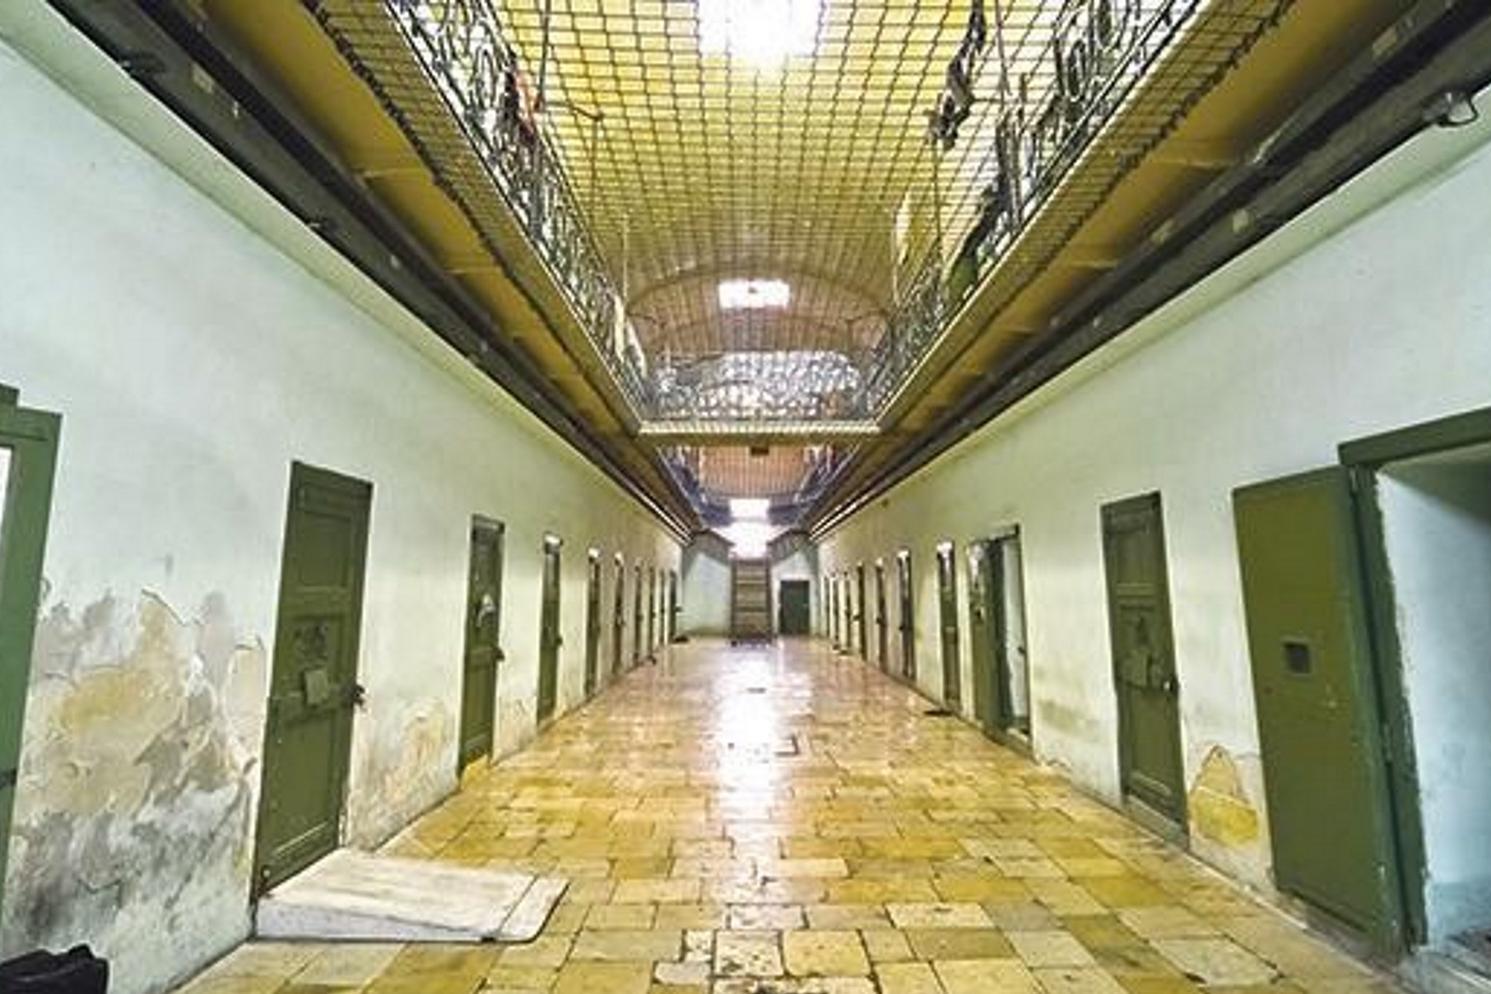 Prisoner found dead in his cell